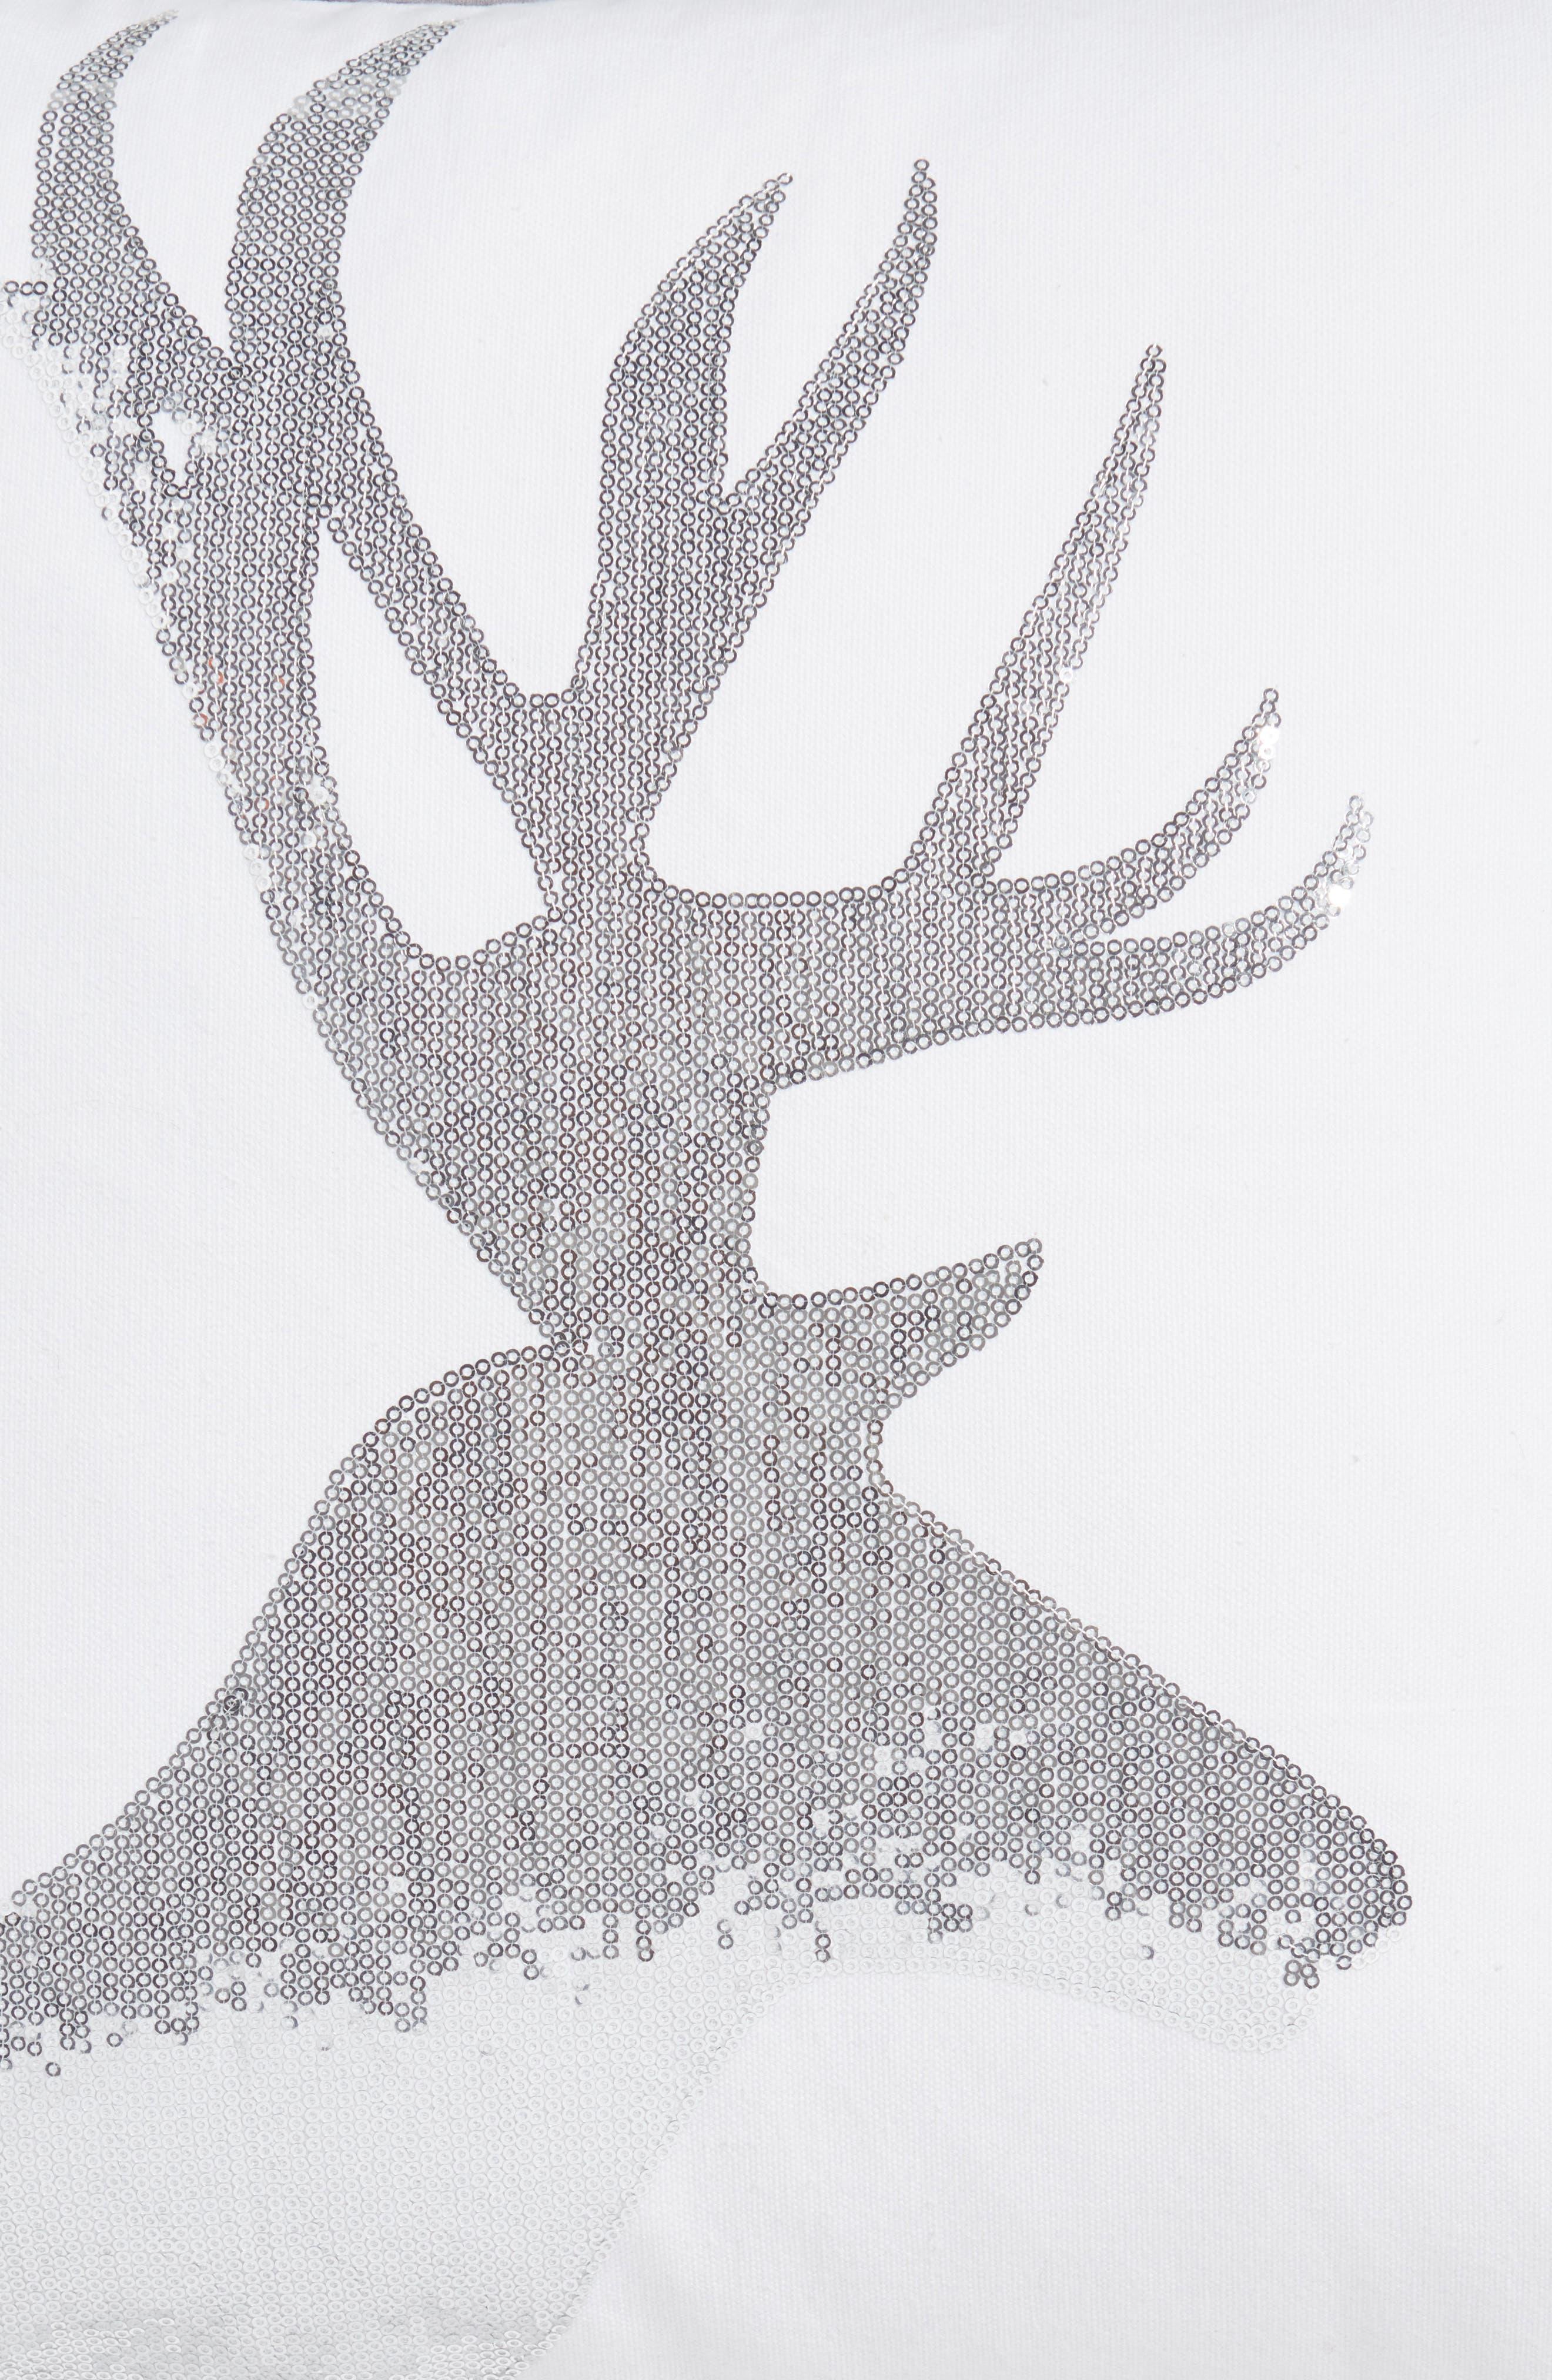 Sequin Reindeer Pillow,                             Alternate thumbnail 3, color,                             100